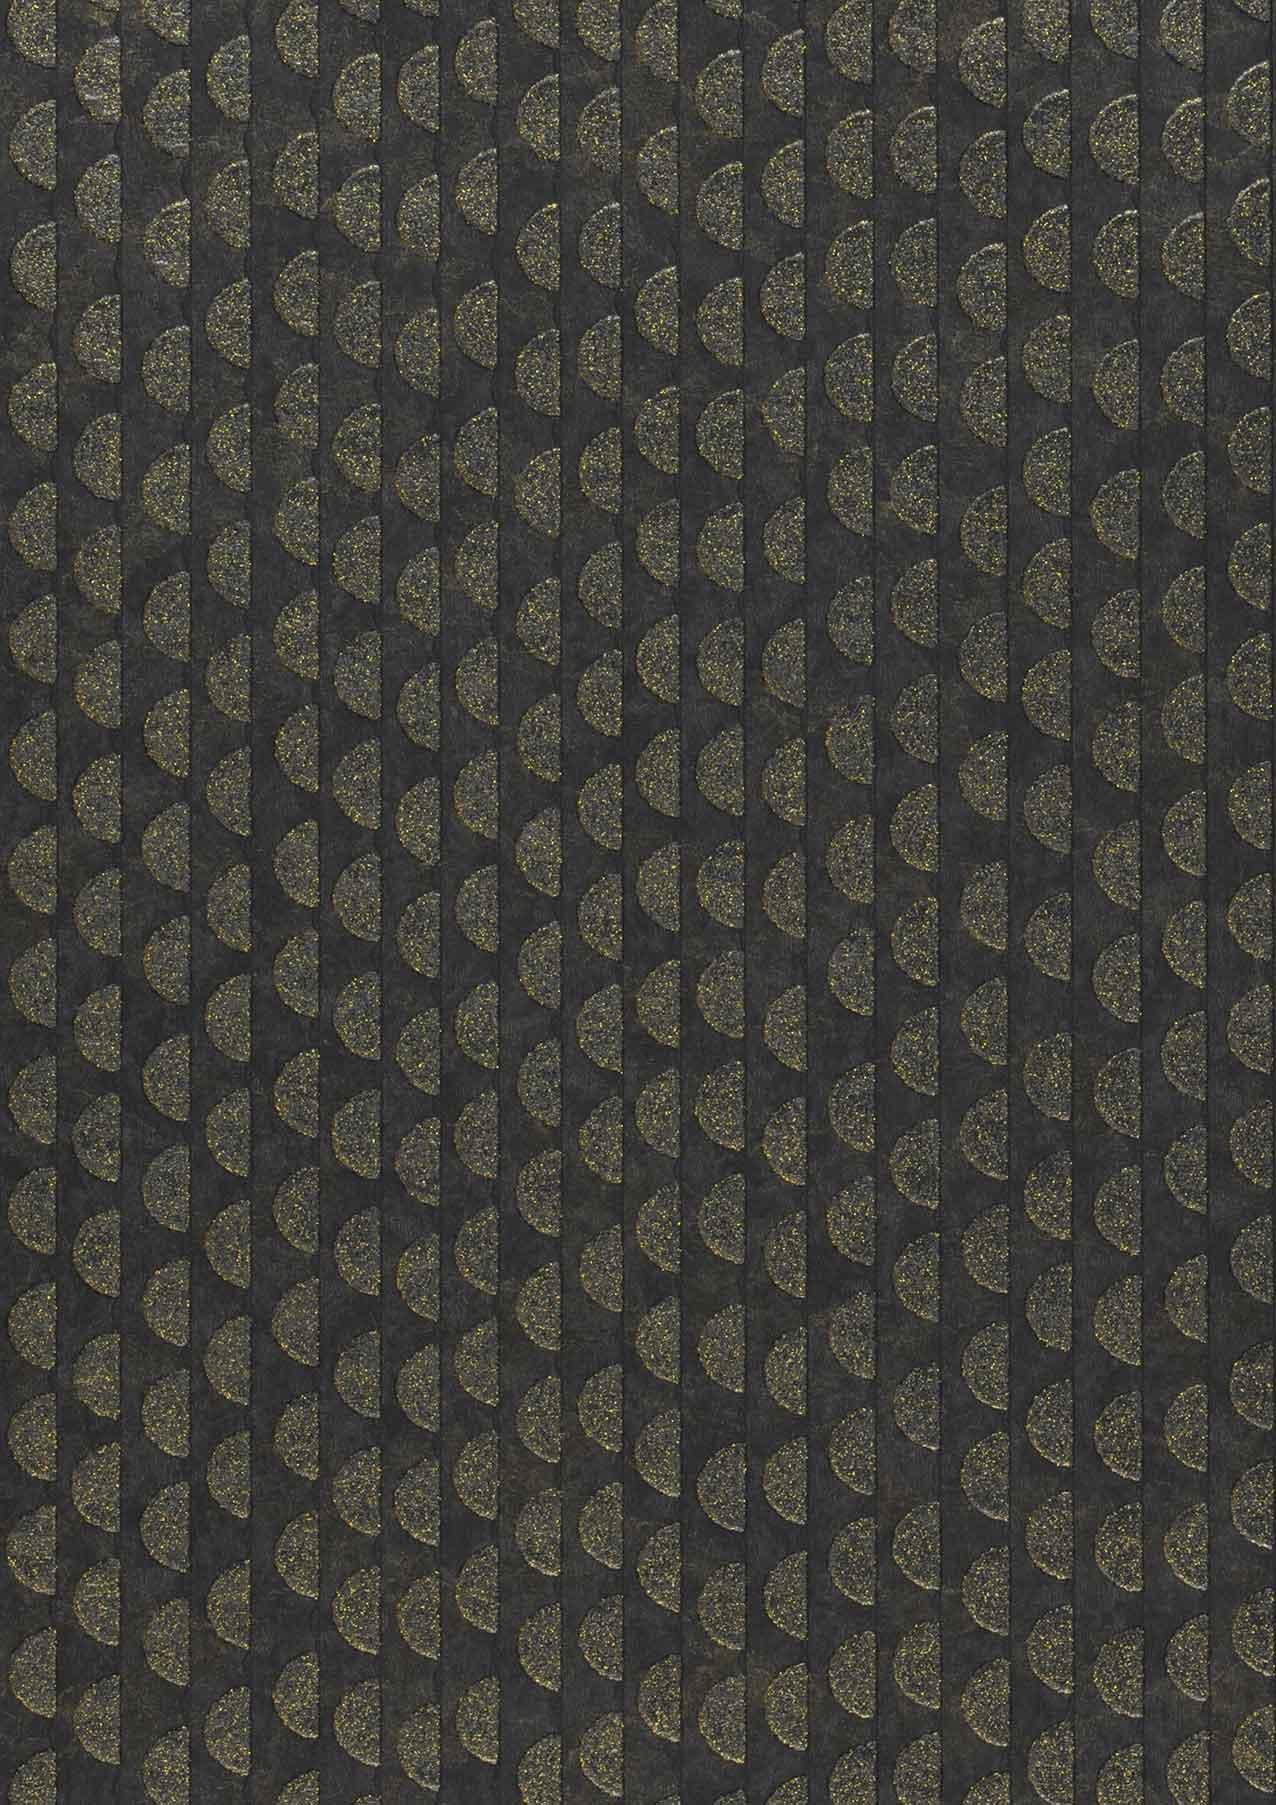 Tapete kelem gold schwarz gold glitzer tapeten der 70er for Tapete gold schwarz